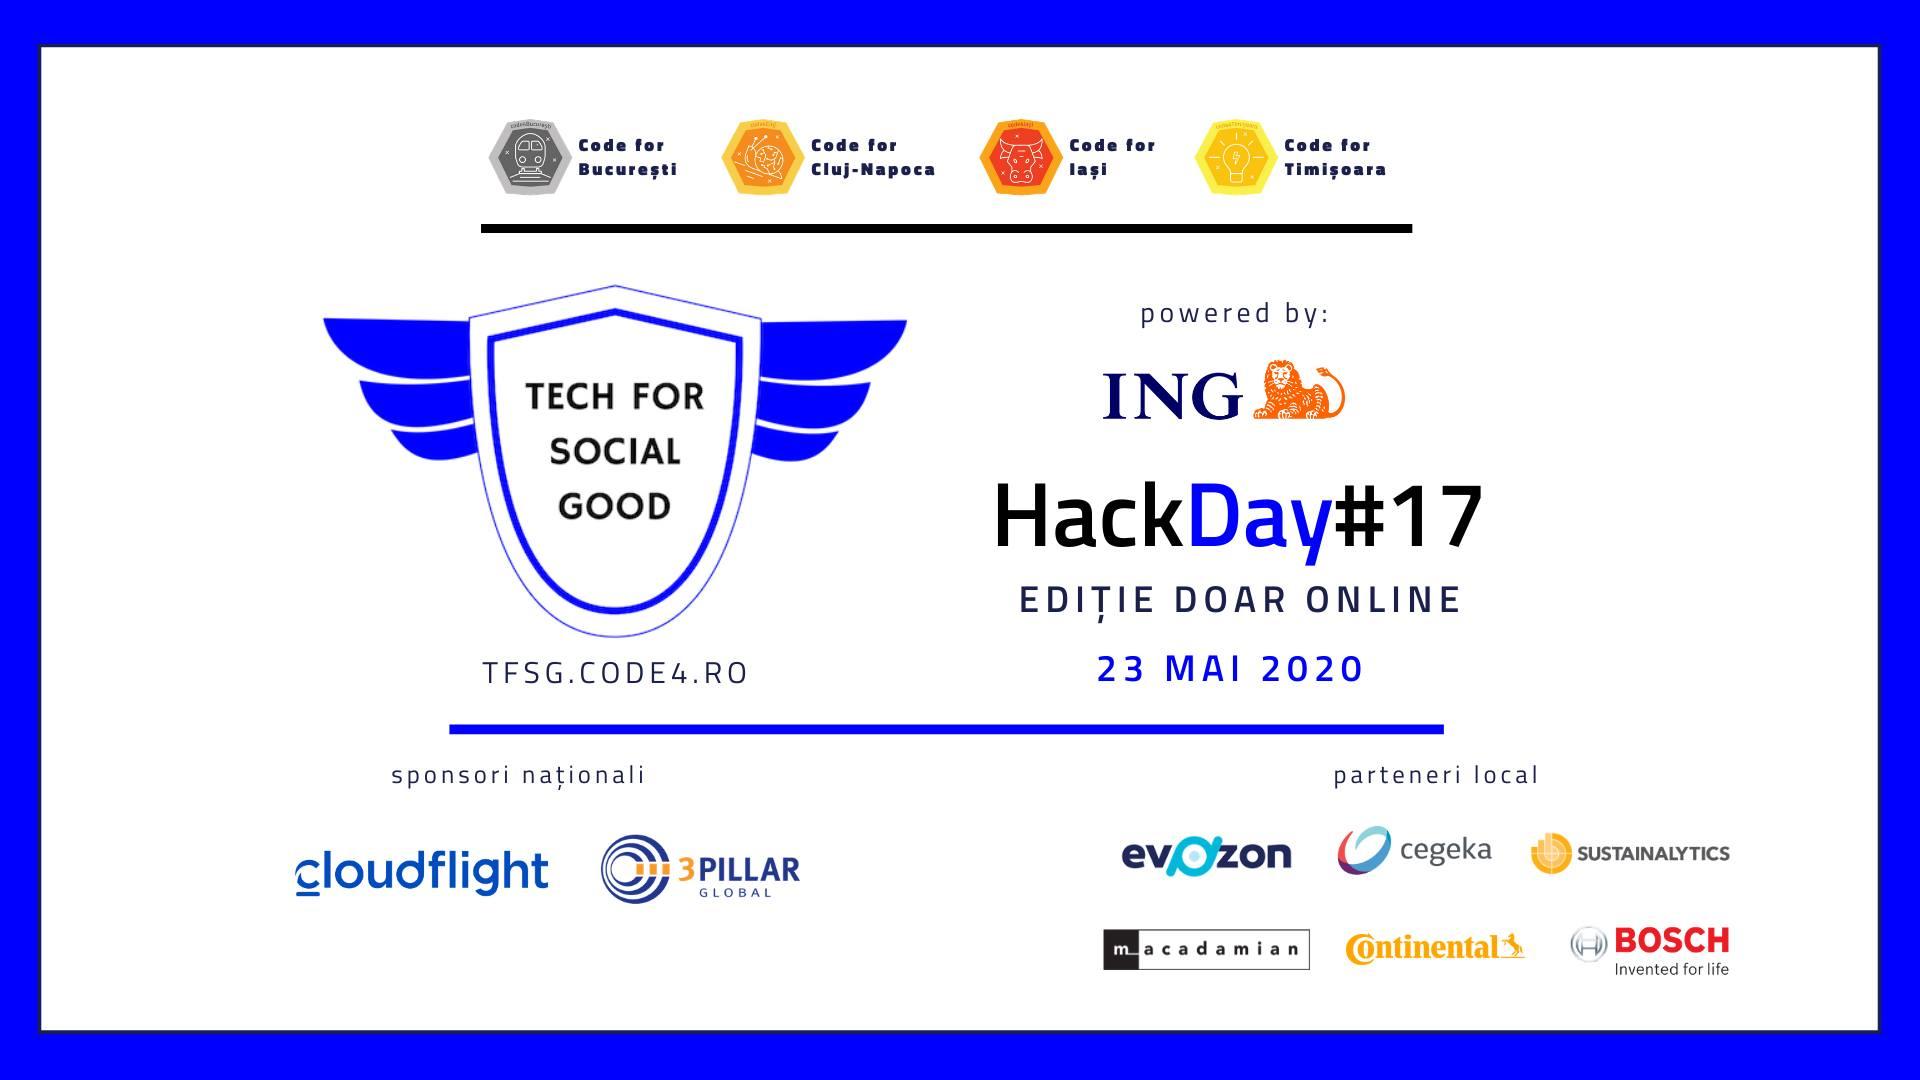 HackDay#17 | Ediție online cu proiecte Covid-19 și TFSG